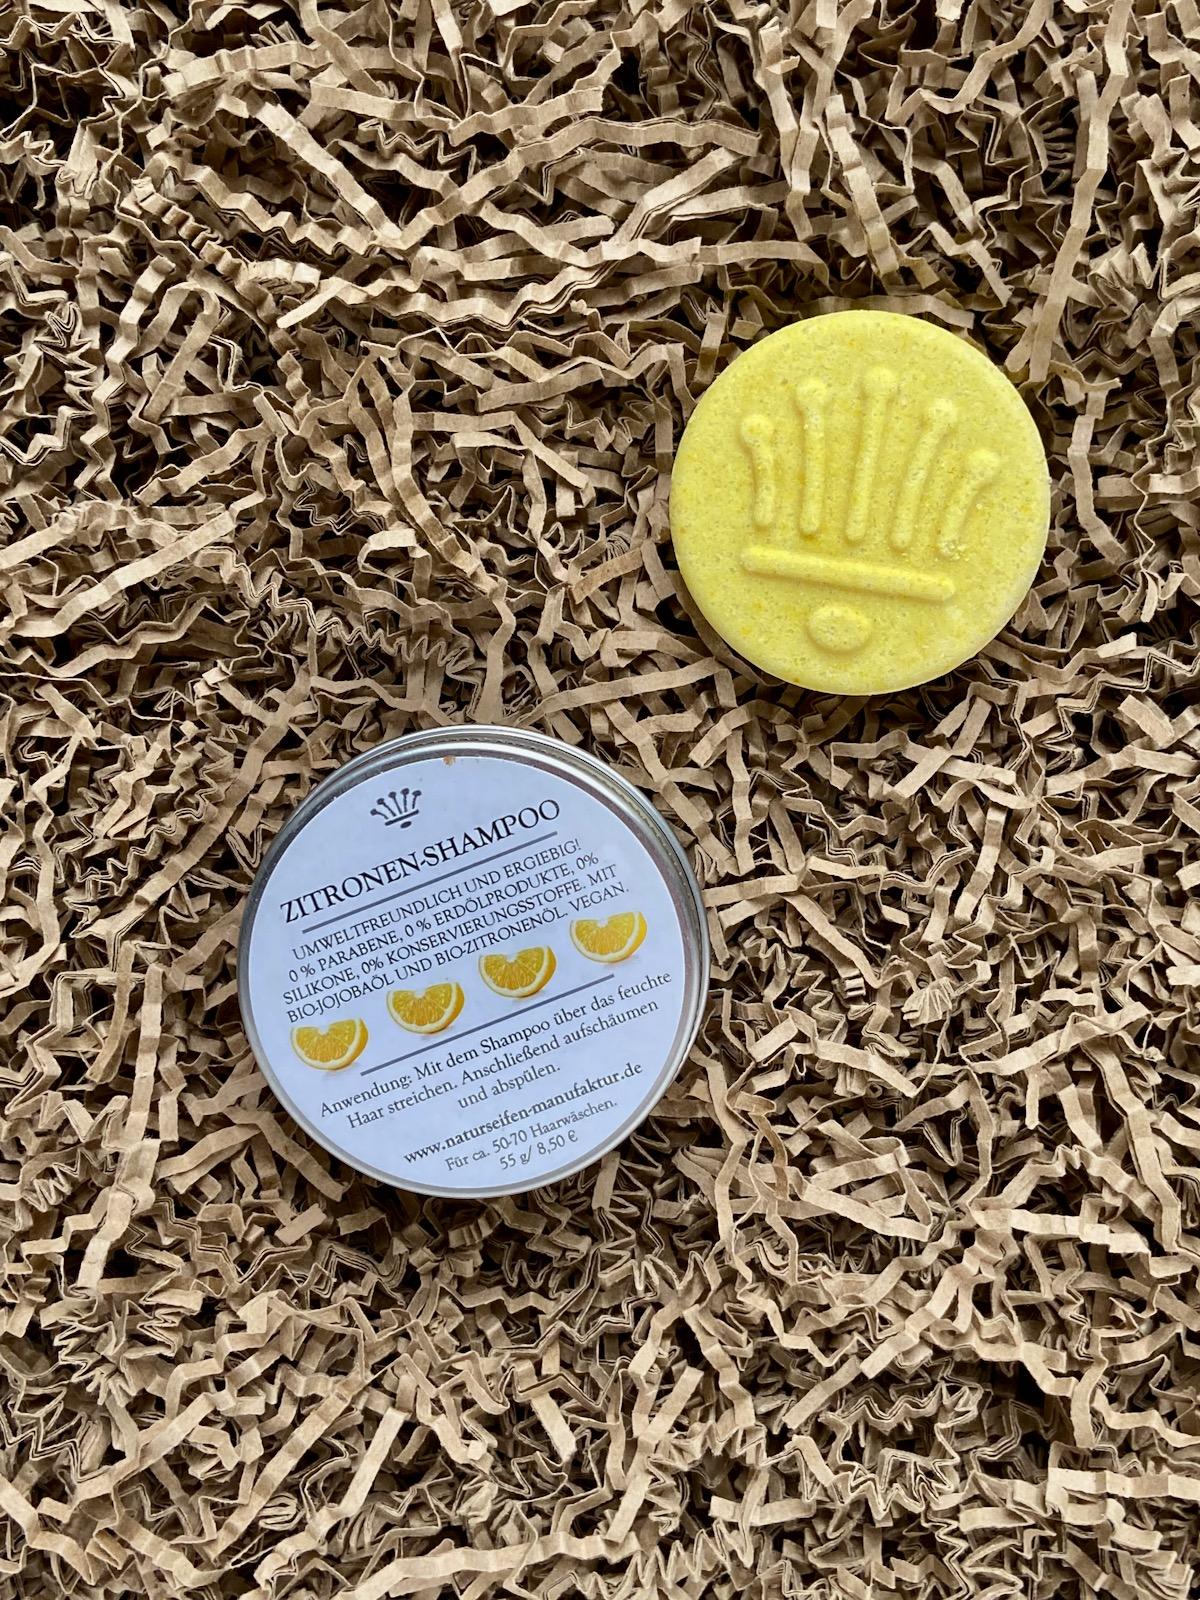 Naturseifen Manufaktur Uckermark Zitronenshampoo